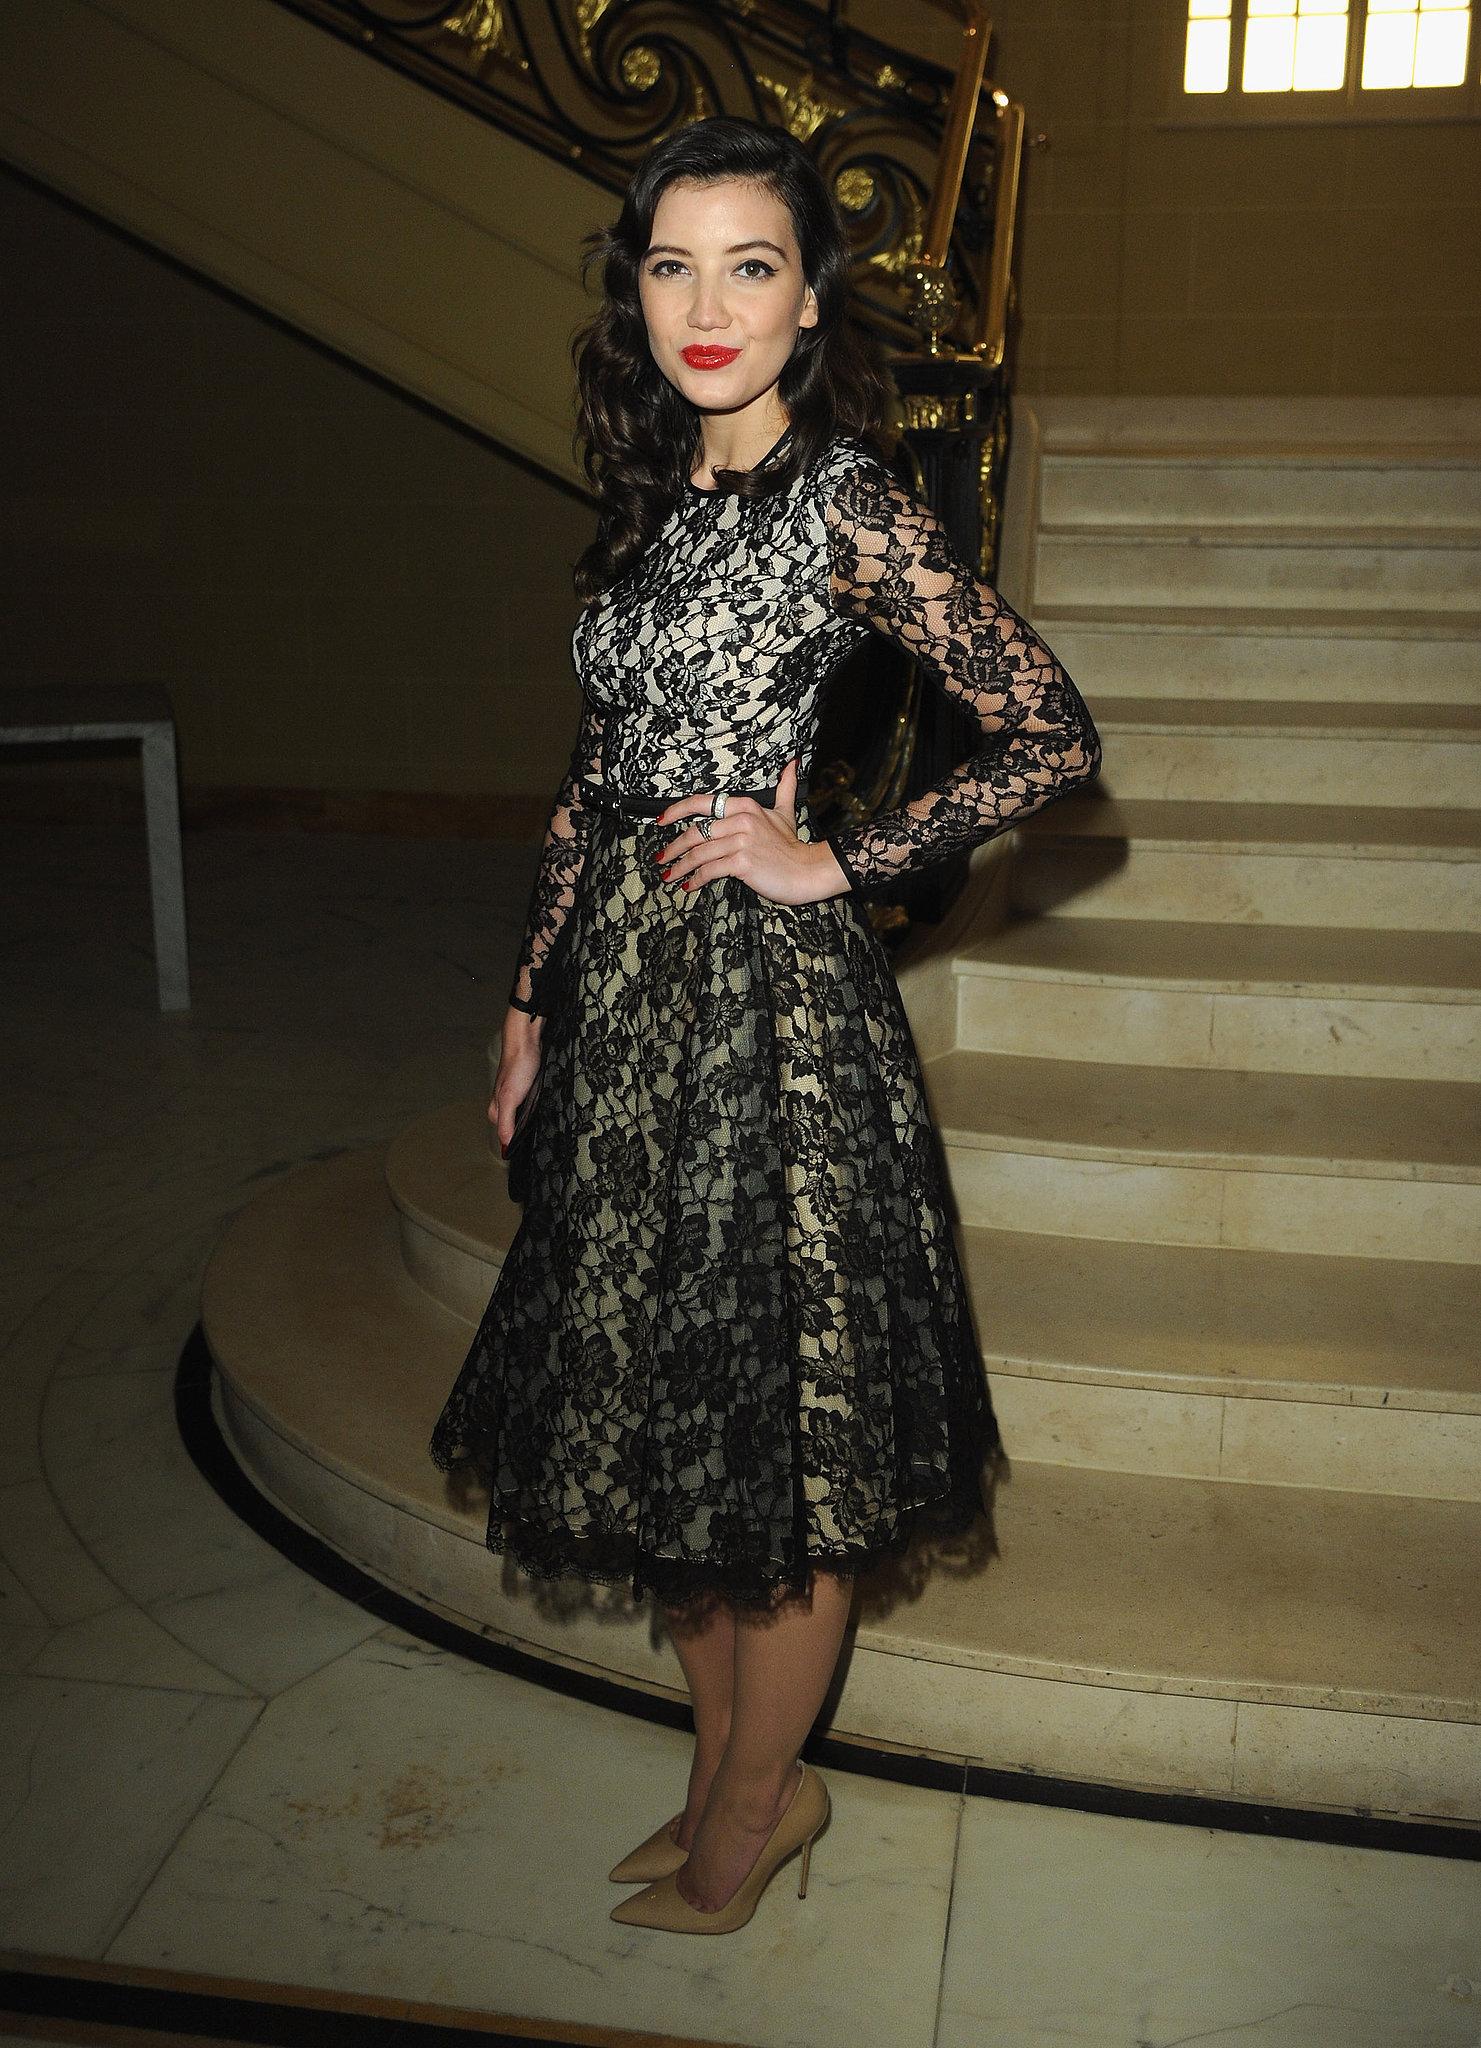 Daisy Lowe wore pre-Fall 2013 Michael Kors at Vogue and Alexandra Shulman's dinner honoring Michael Kors in London.